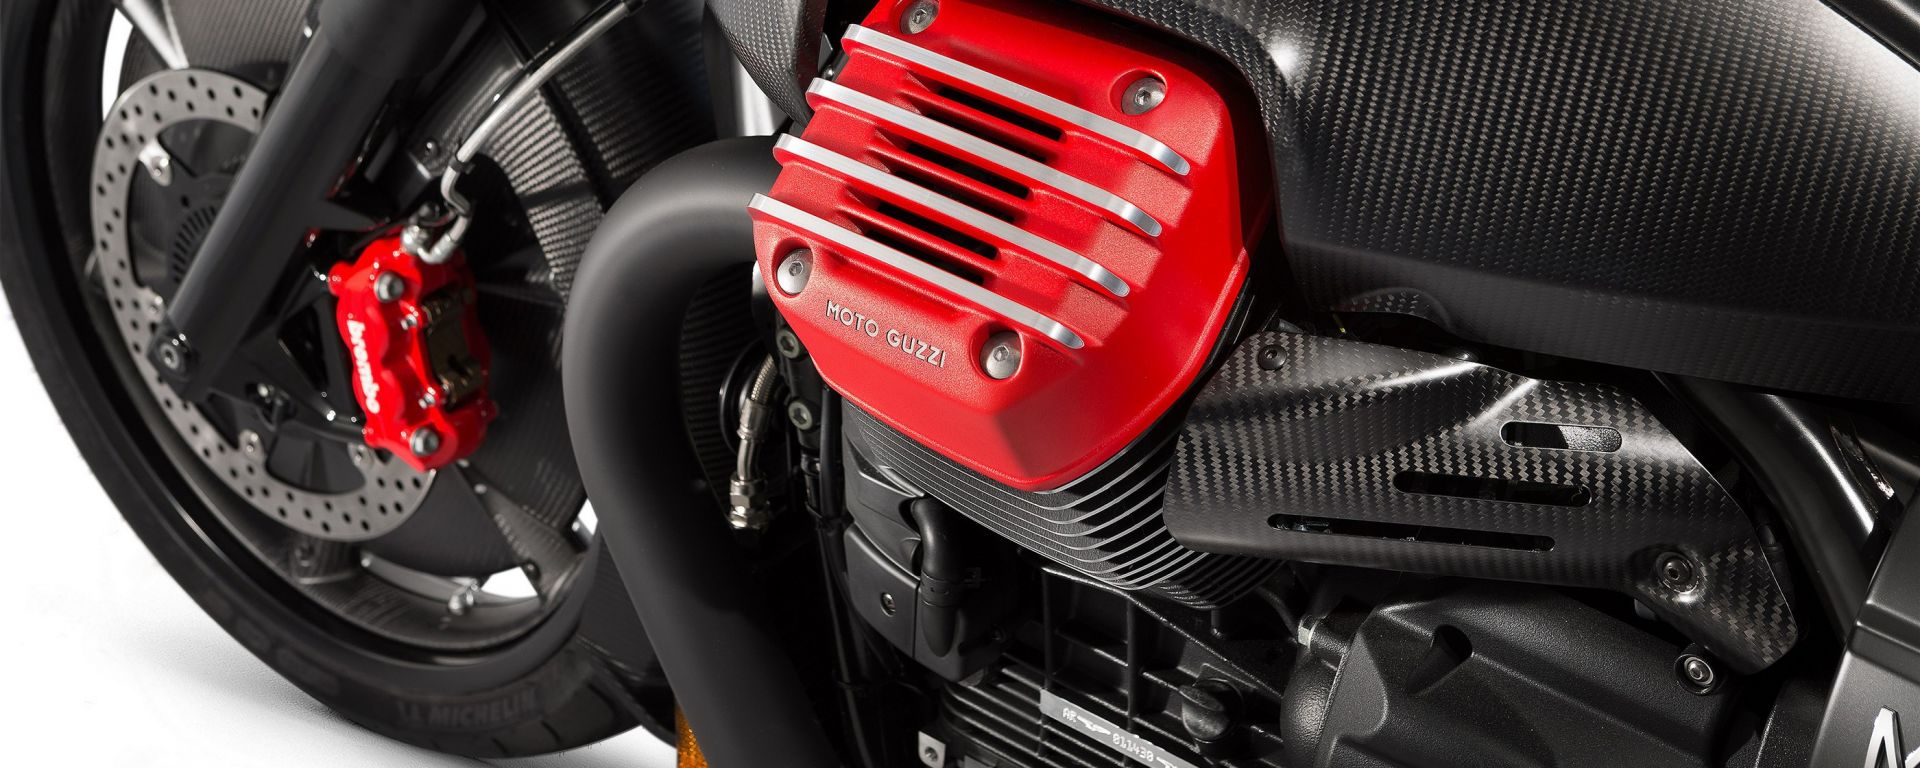 Moto Guzzi MGX-21, il motore